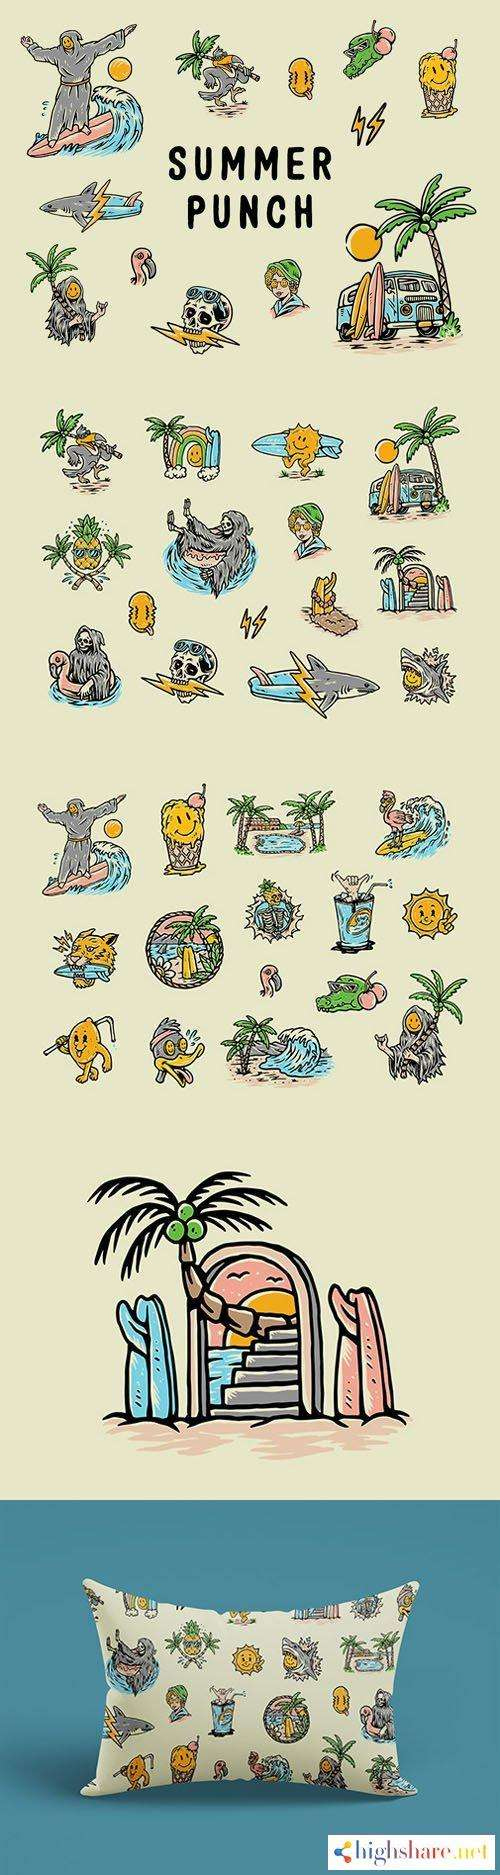 30 summer punch hand drawn illustrations 5f452ee390782 - 30 Summer Punch Hand-drawn Illustrations